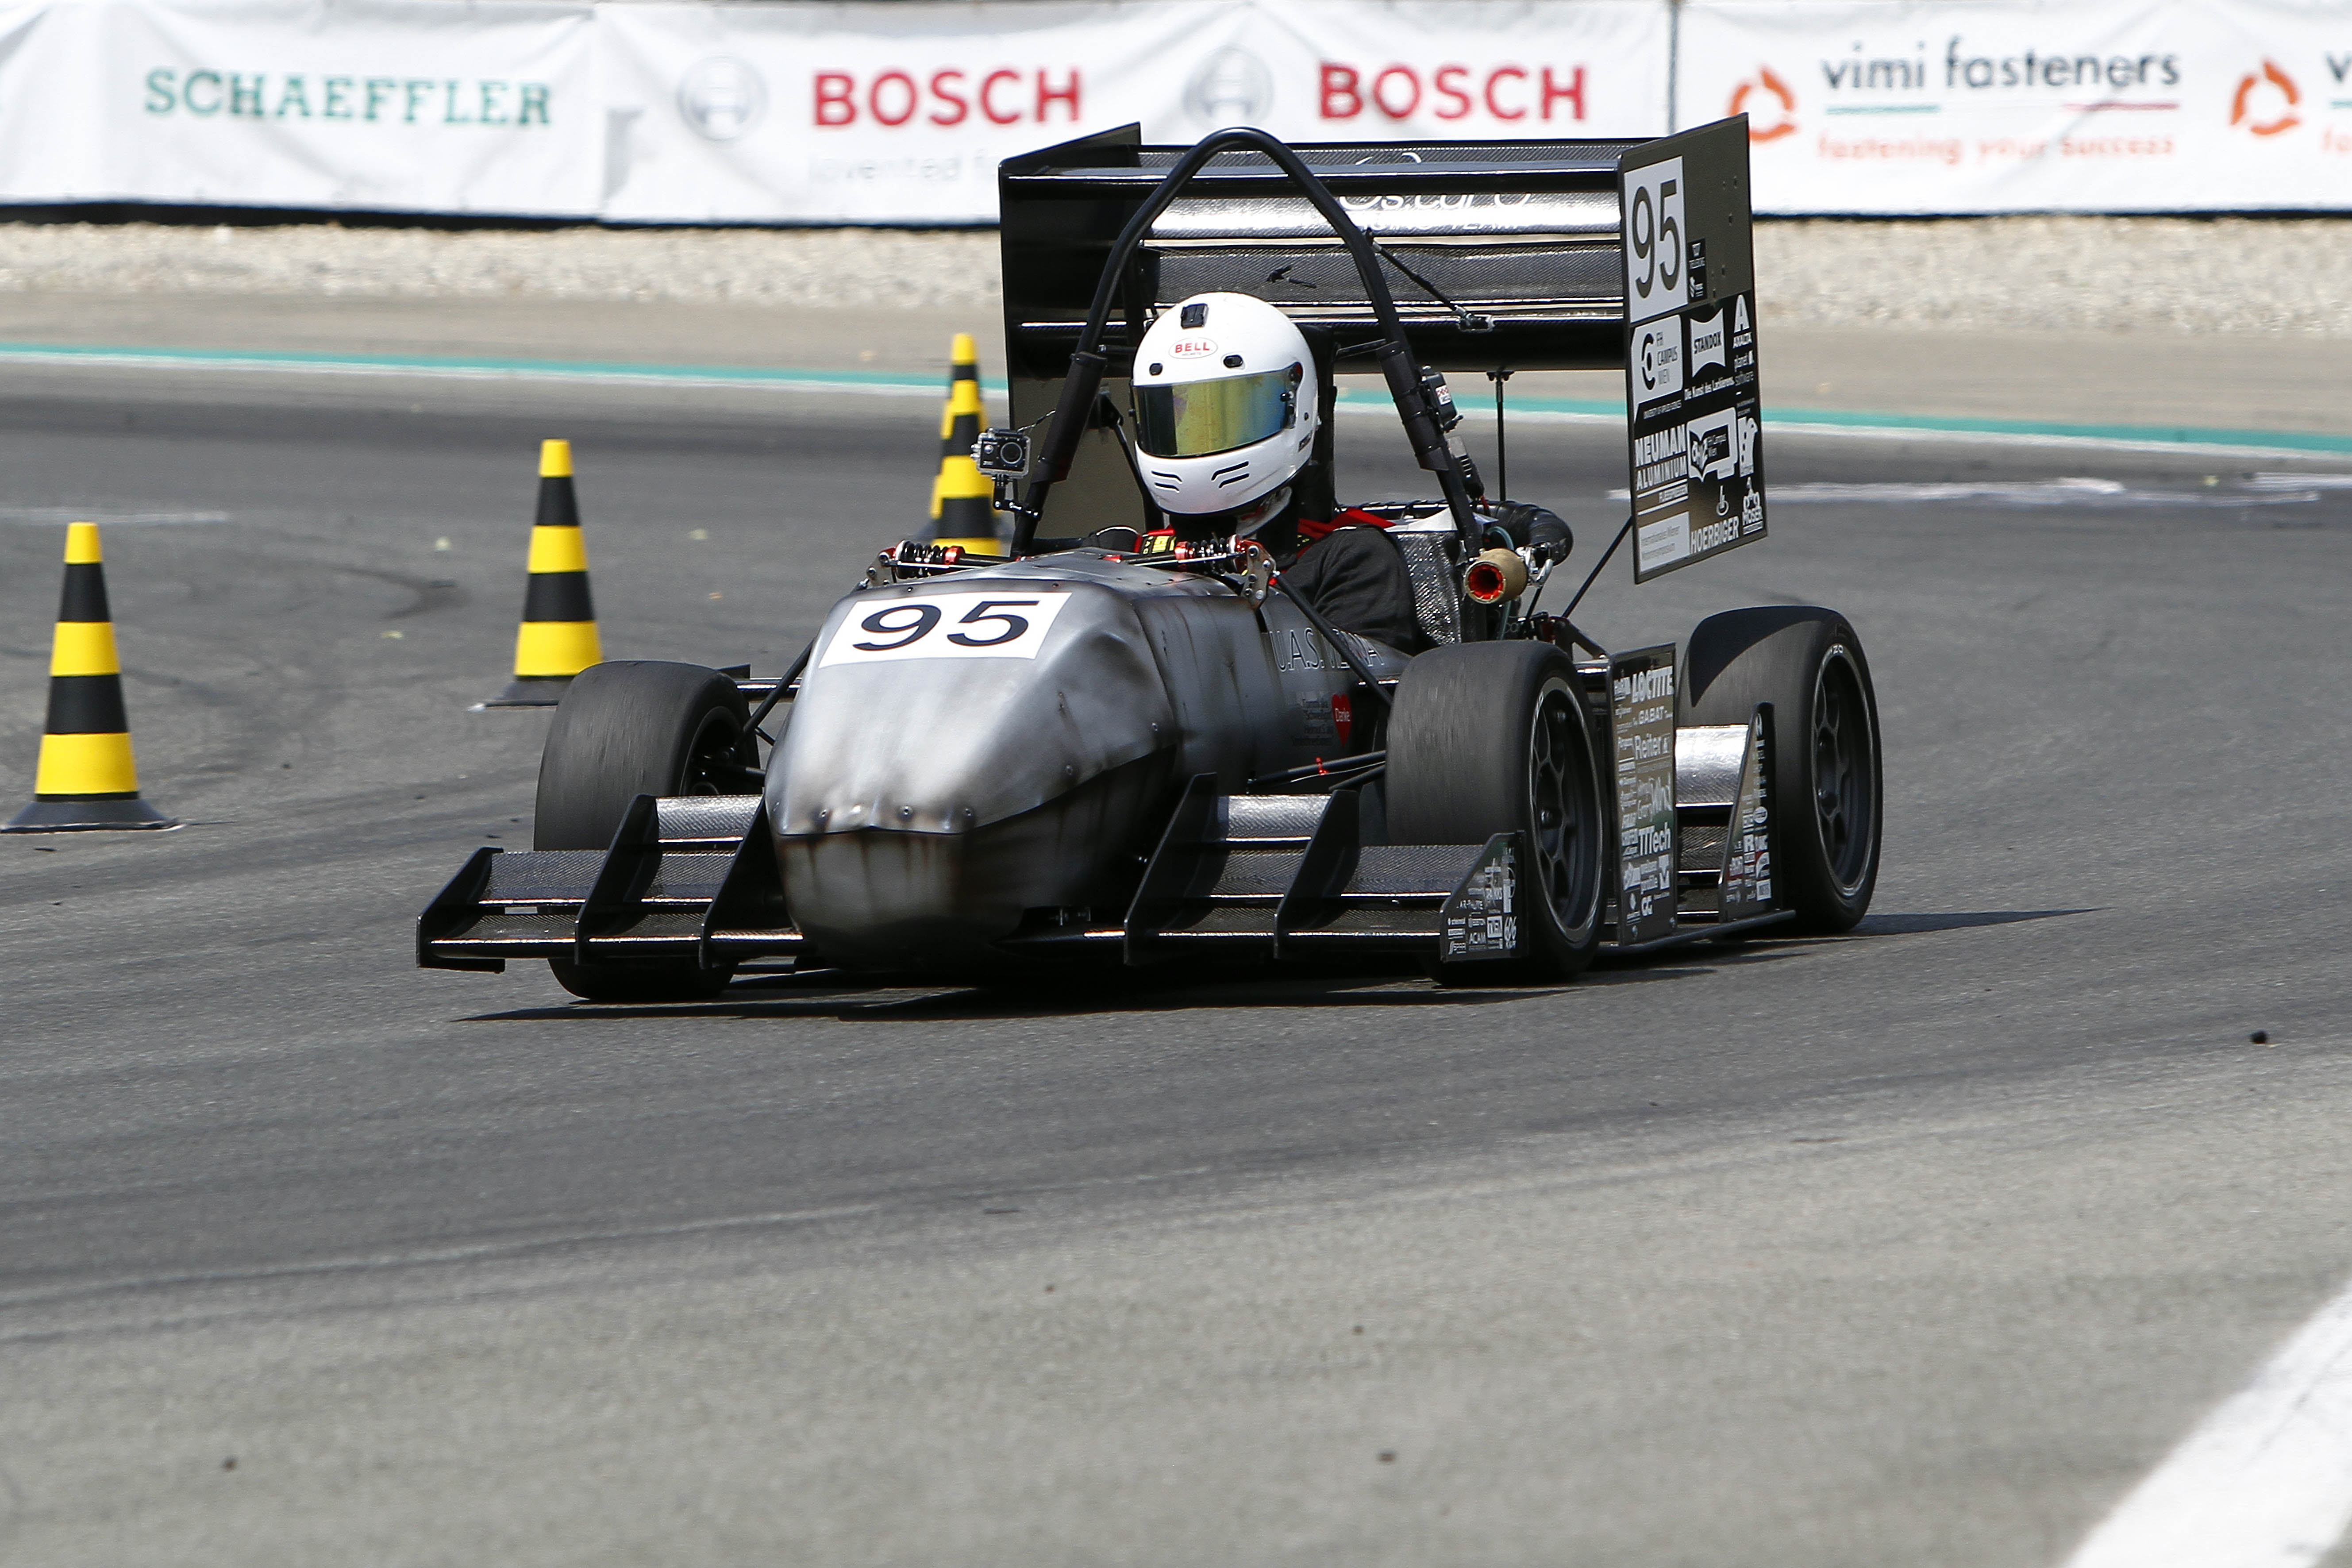 Formula SAE Italy, Formula Electric Italy & Formula Driverless - Bosch a caccia di giovani talenti: focus tecnologia e motori